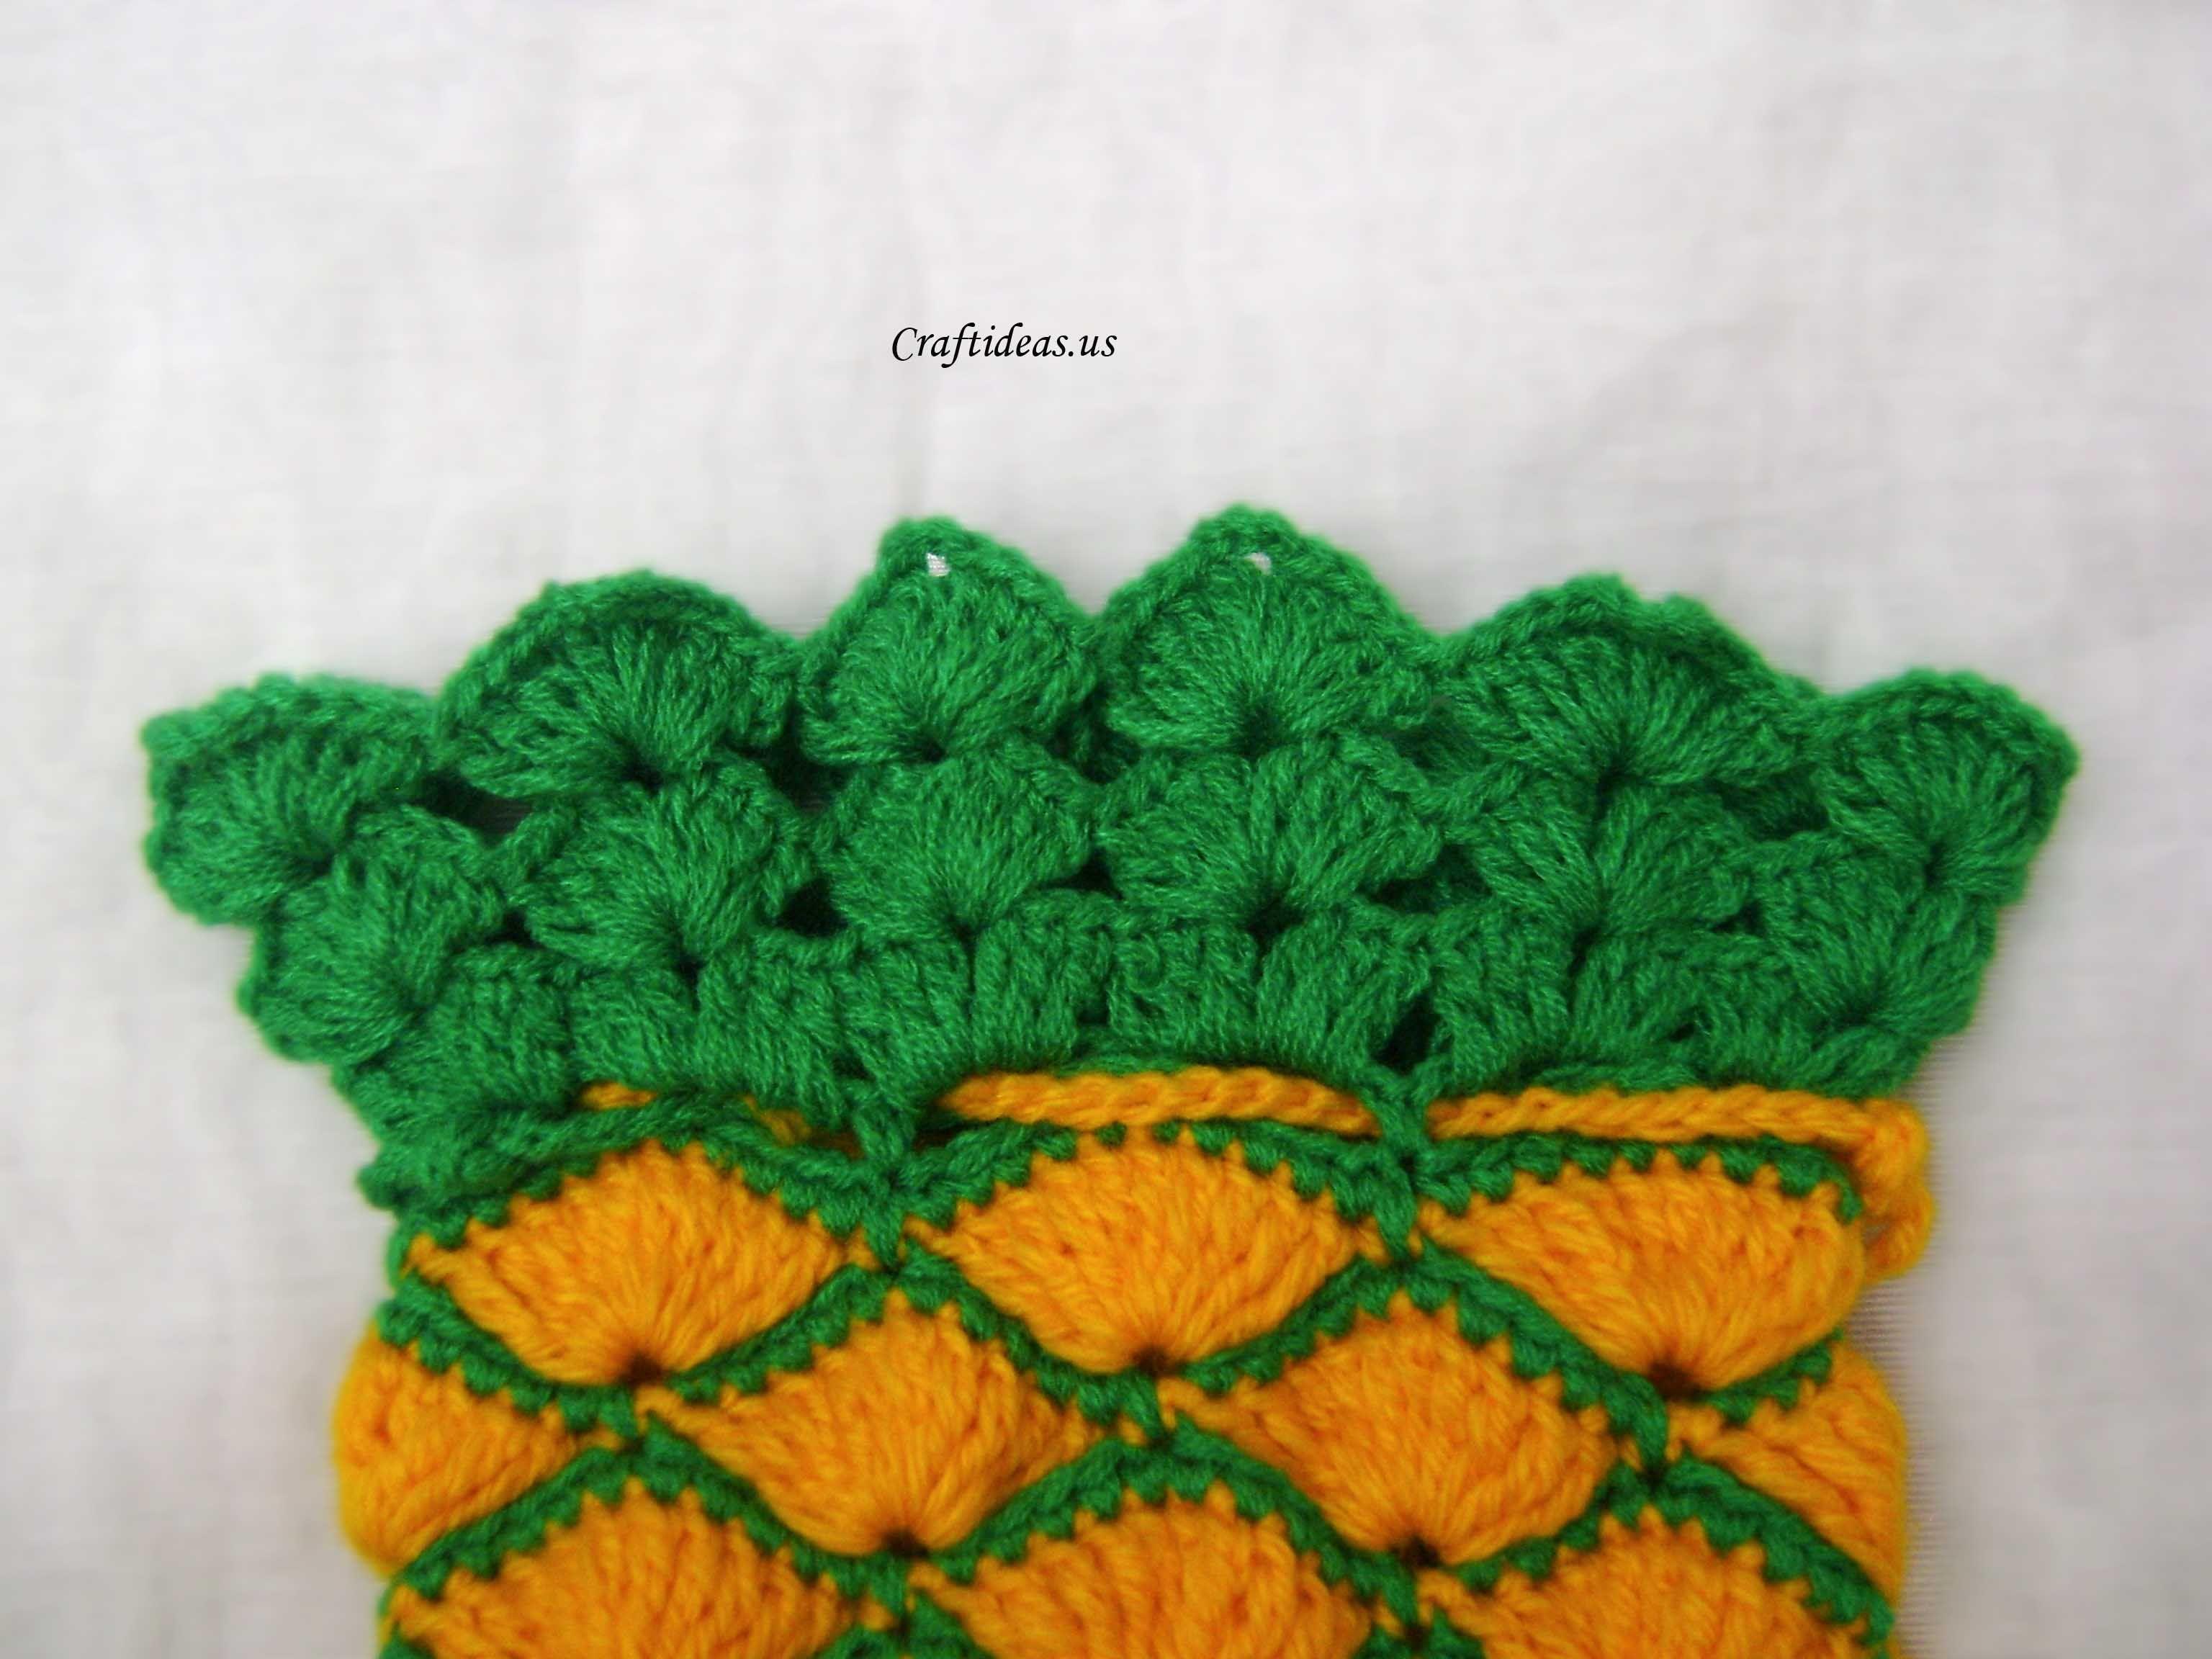 Crochet pineapple bag tutorial | Crochet patterns | Pinterest | Häkeln